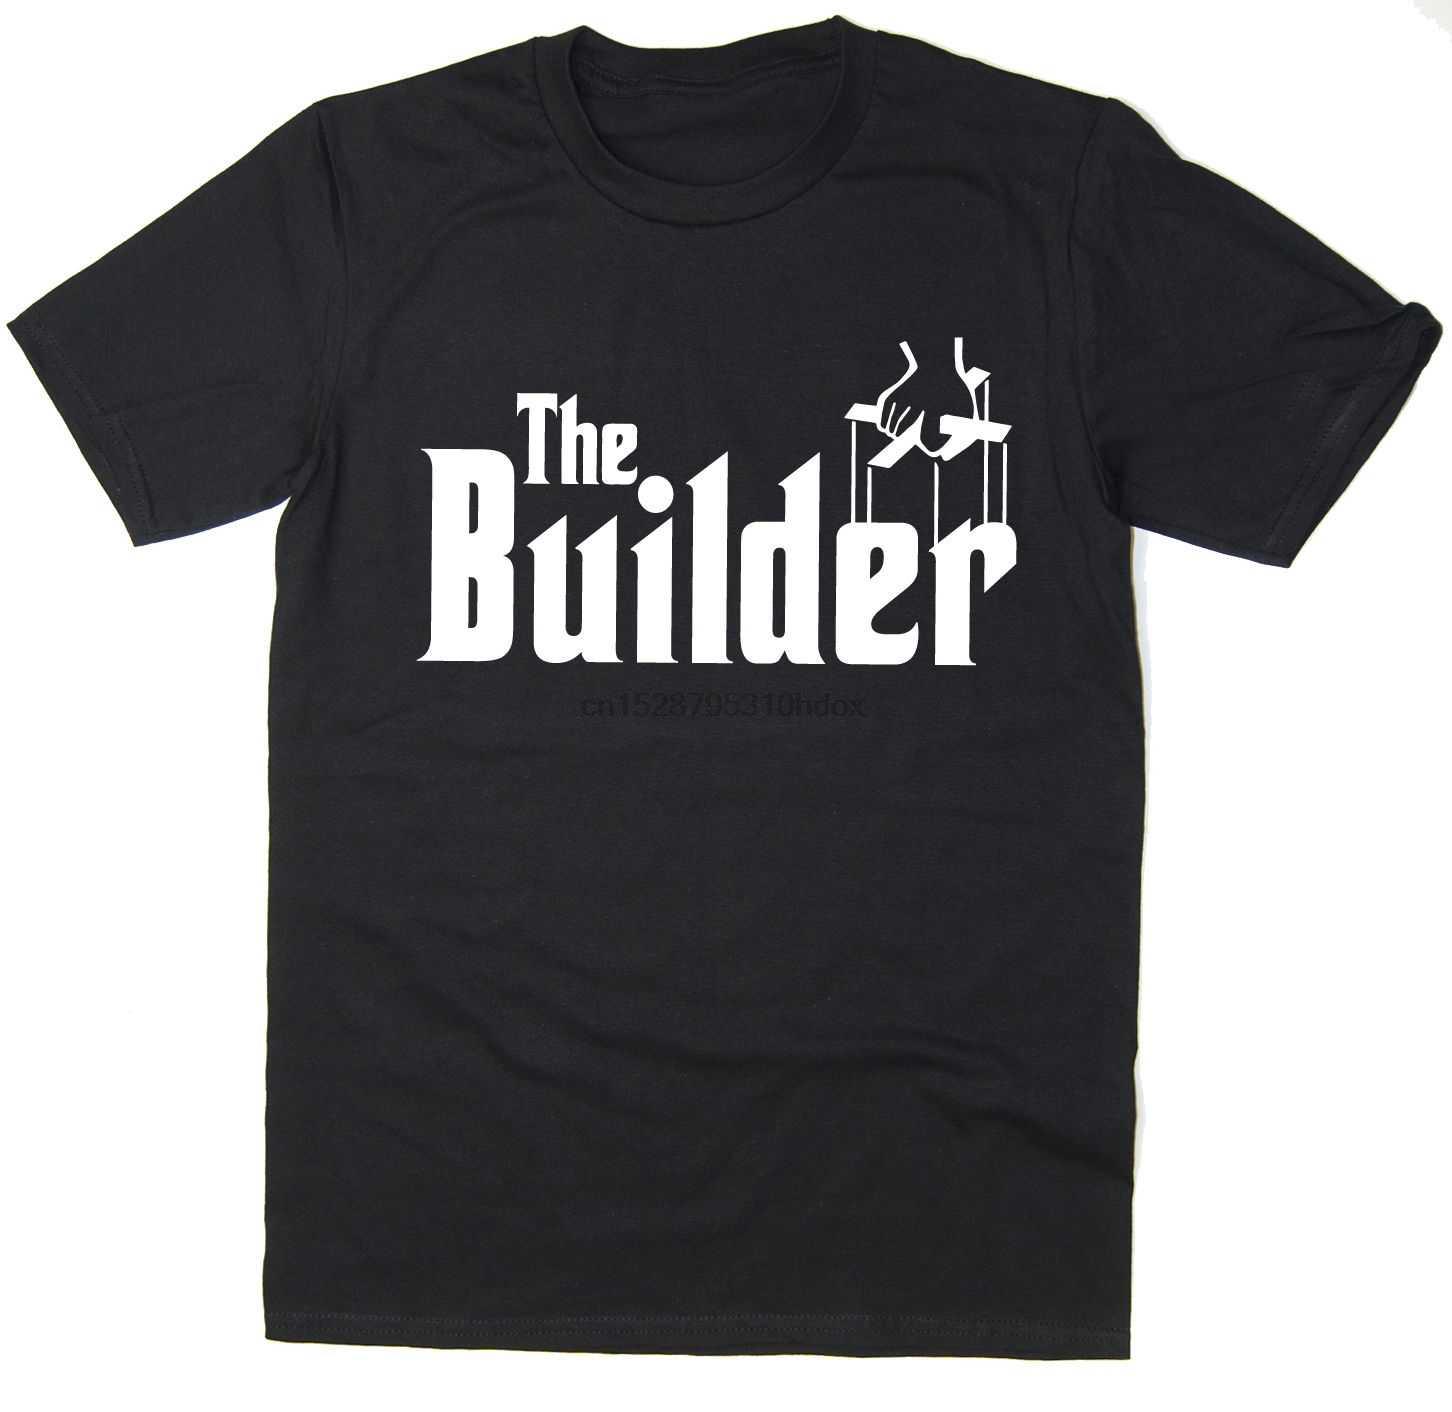 2020 gran oferta envío gratis The Builder-divertida camiseta-parodia de padrino-muchos colores